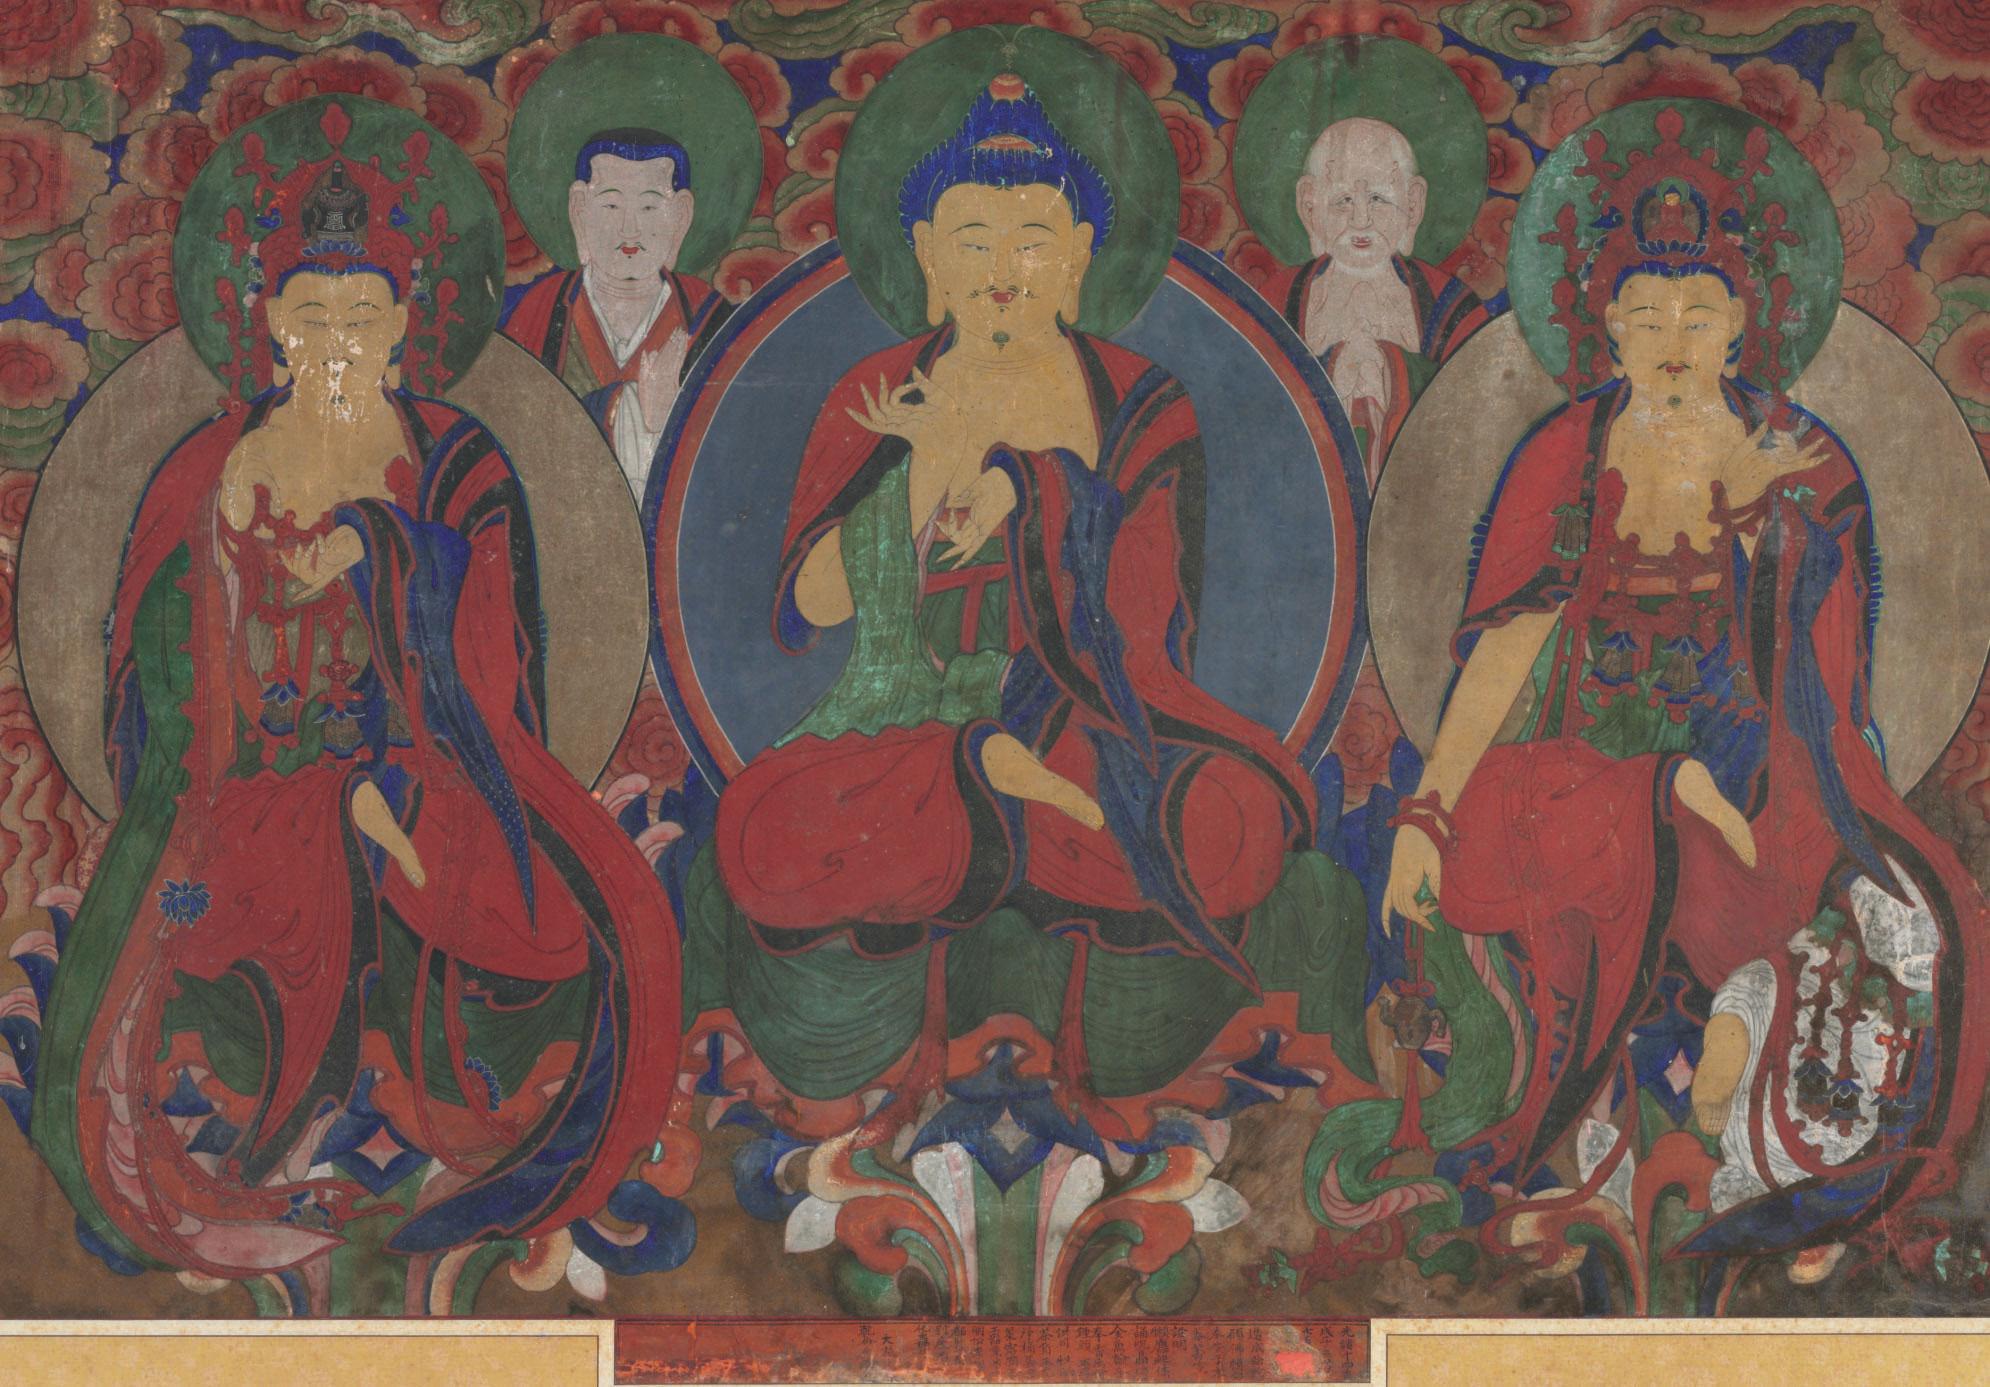 Hangyu (act. 19th century)